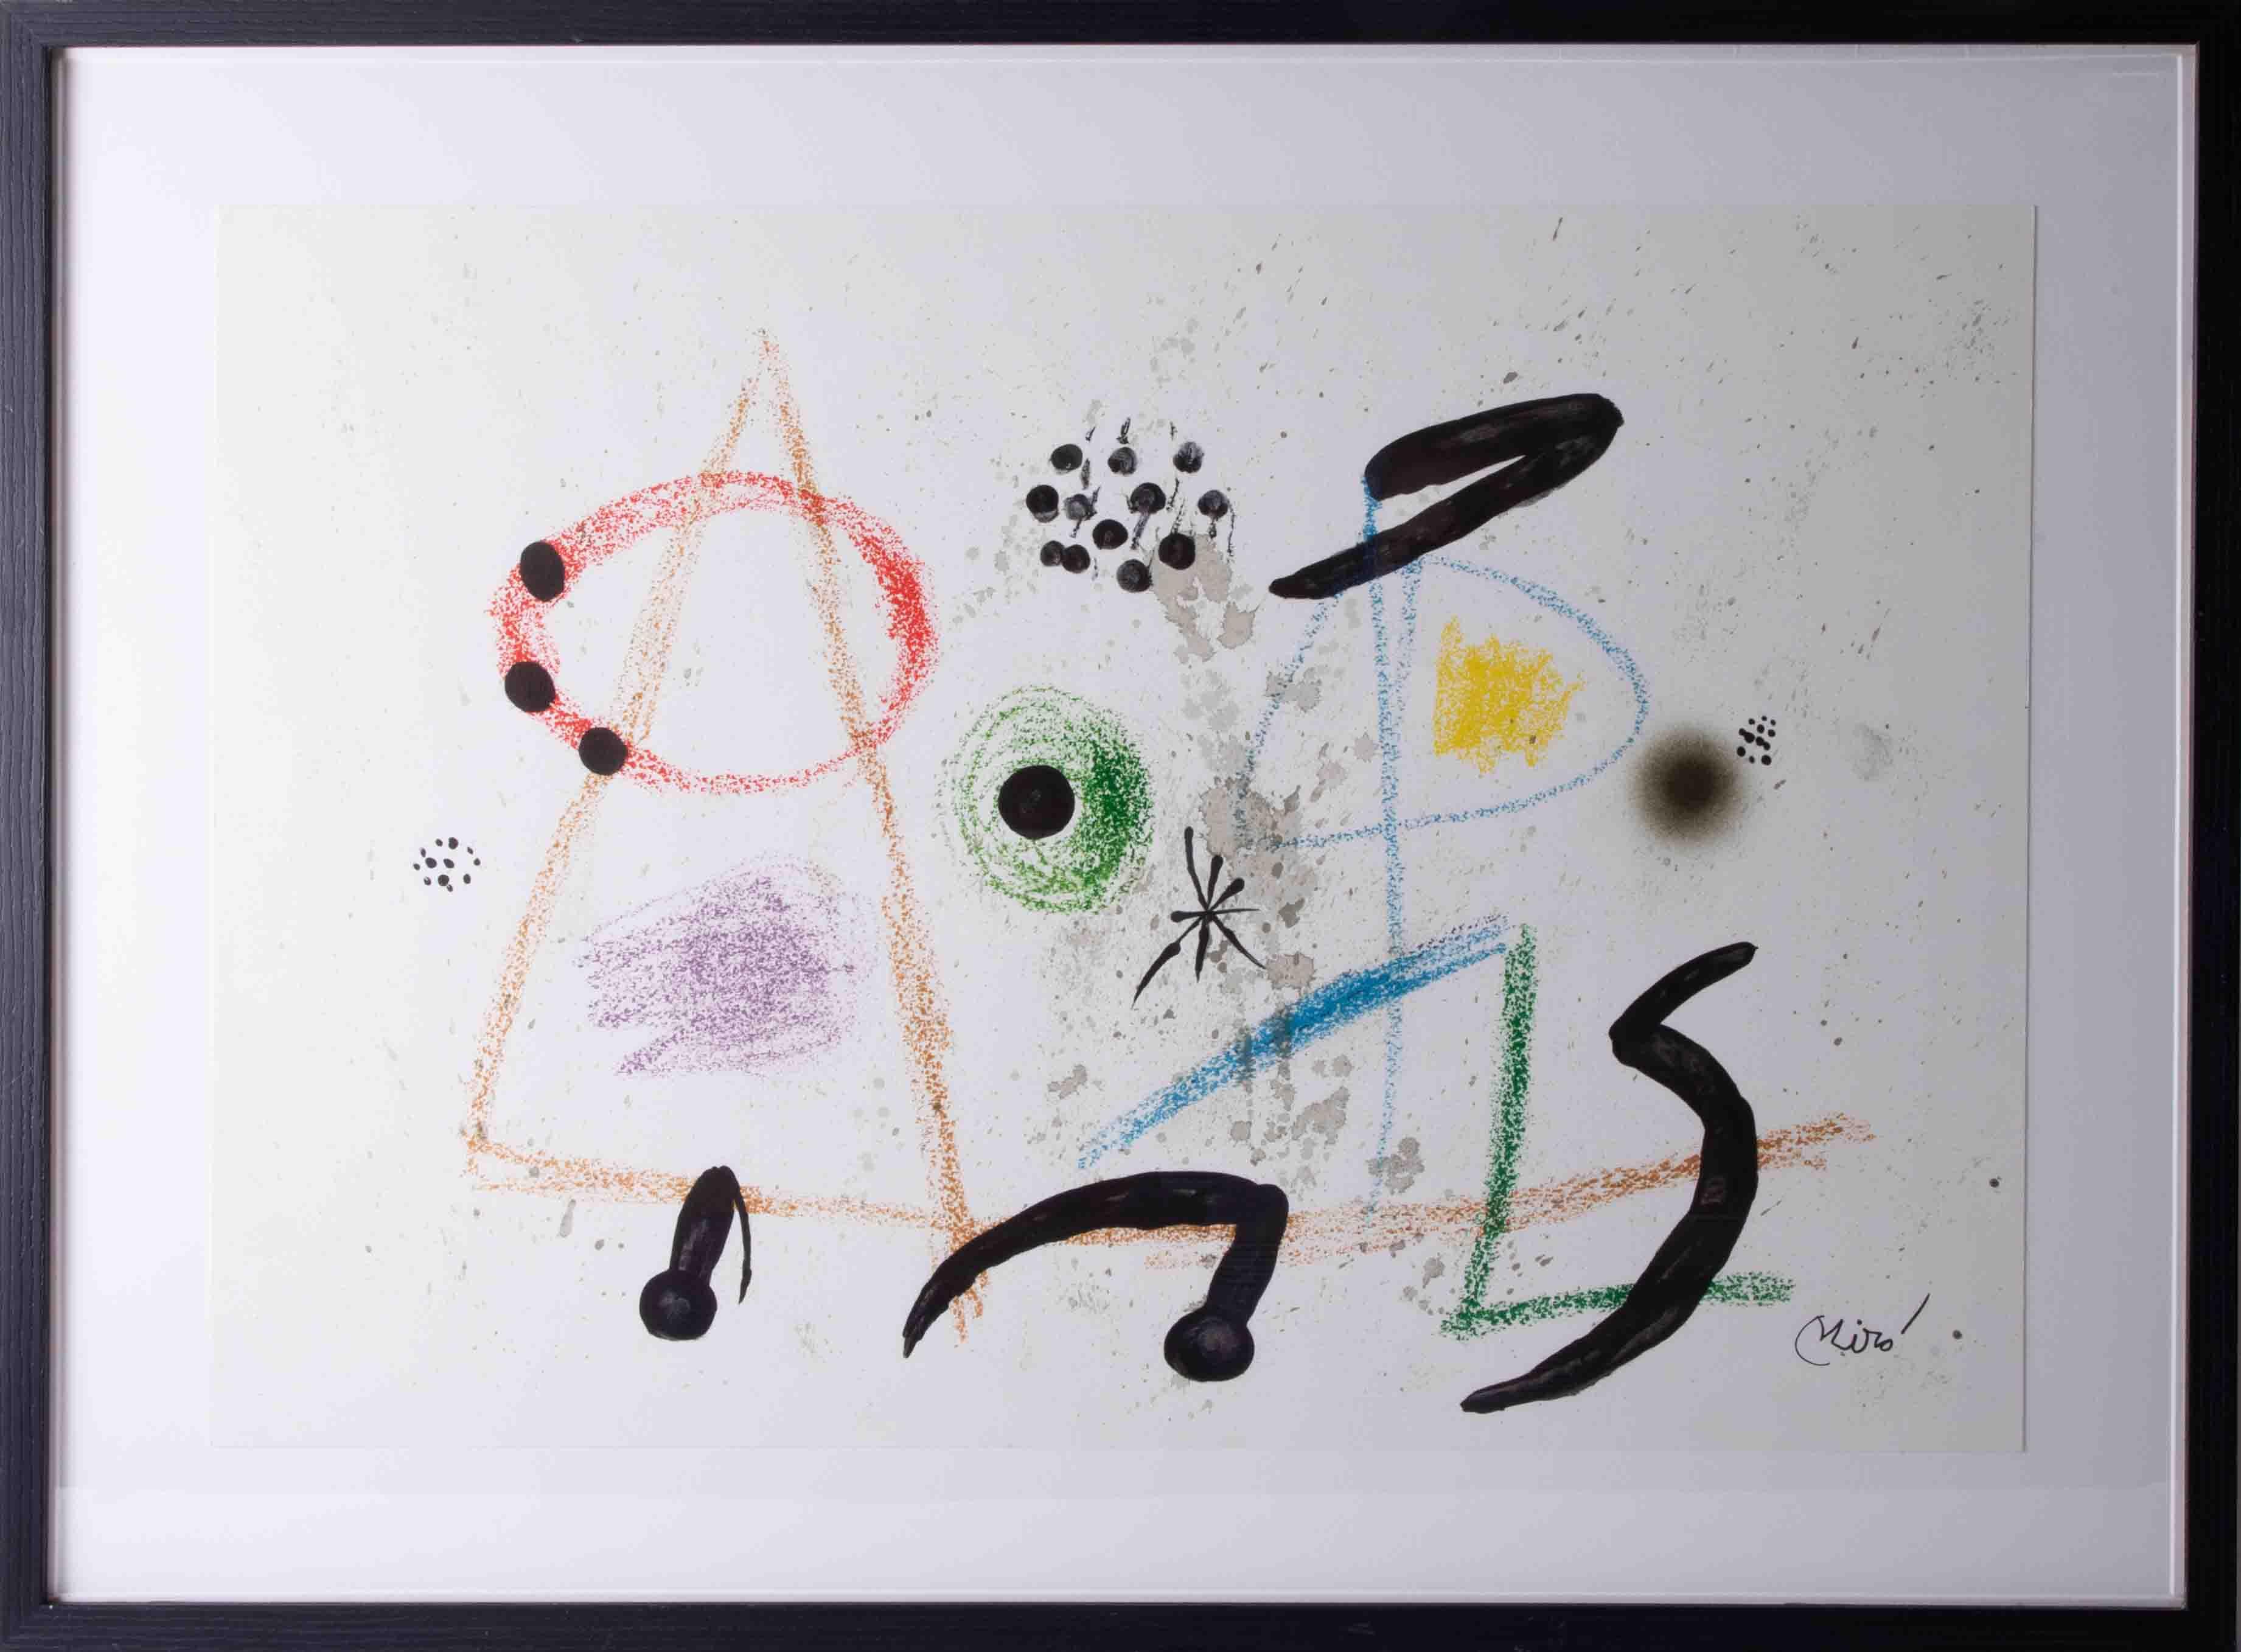 Joan Miro (1893-1983) original lithograph, 50cm x 72cm, framed and glazed.